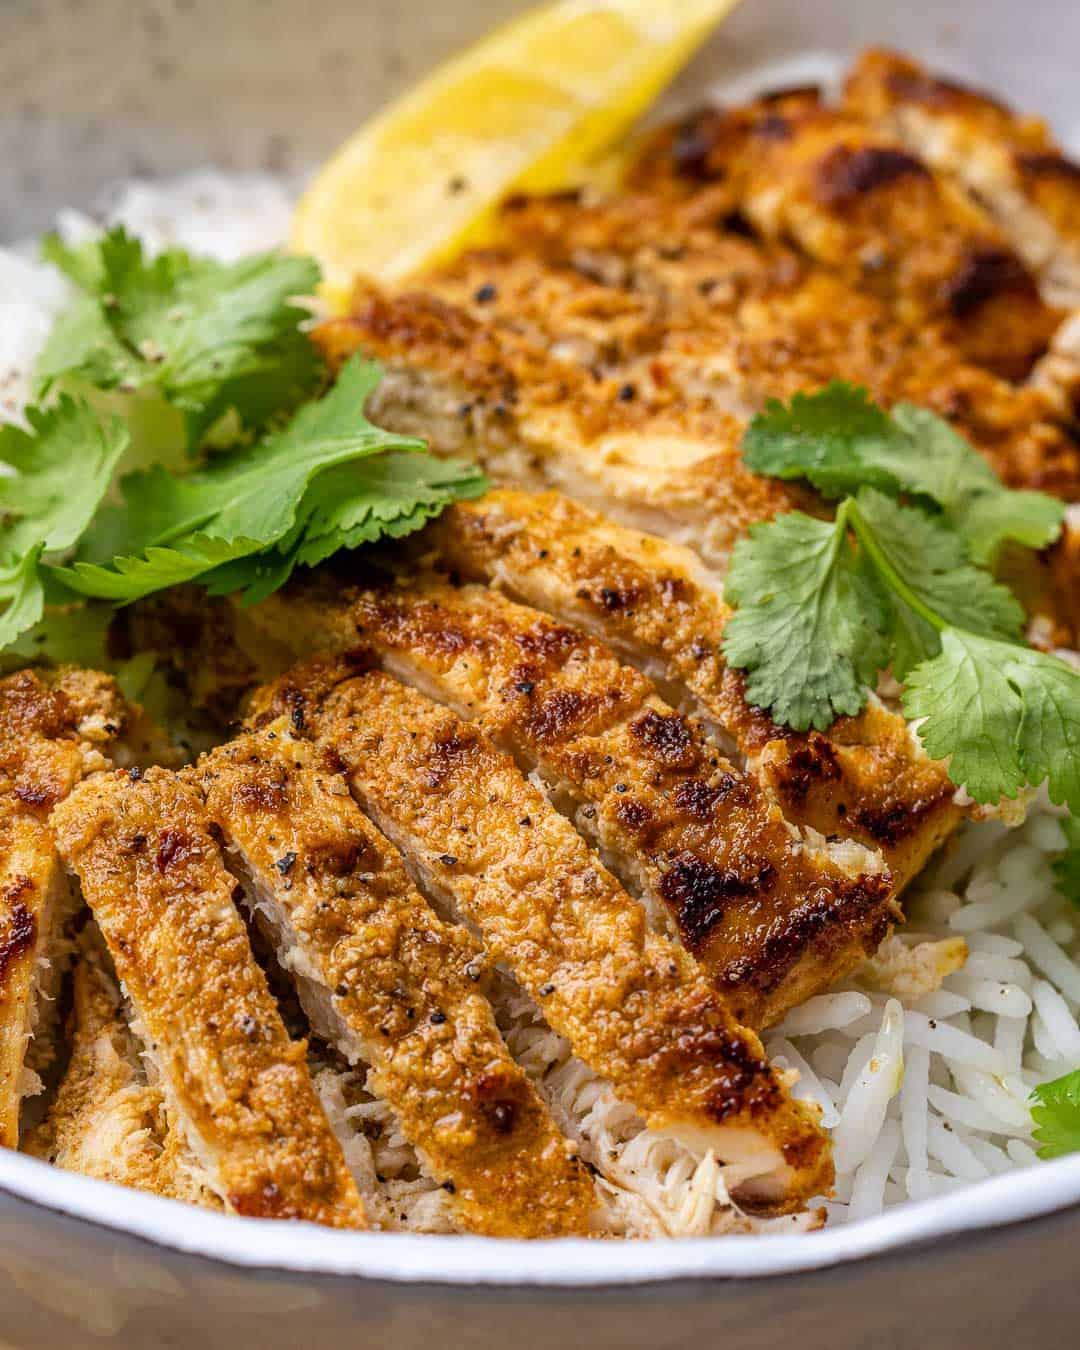 Close view of sliced tandoori chicken served over rice with cilantro garnish